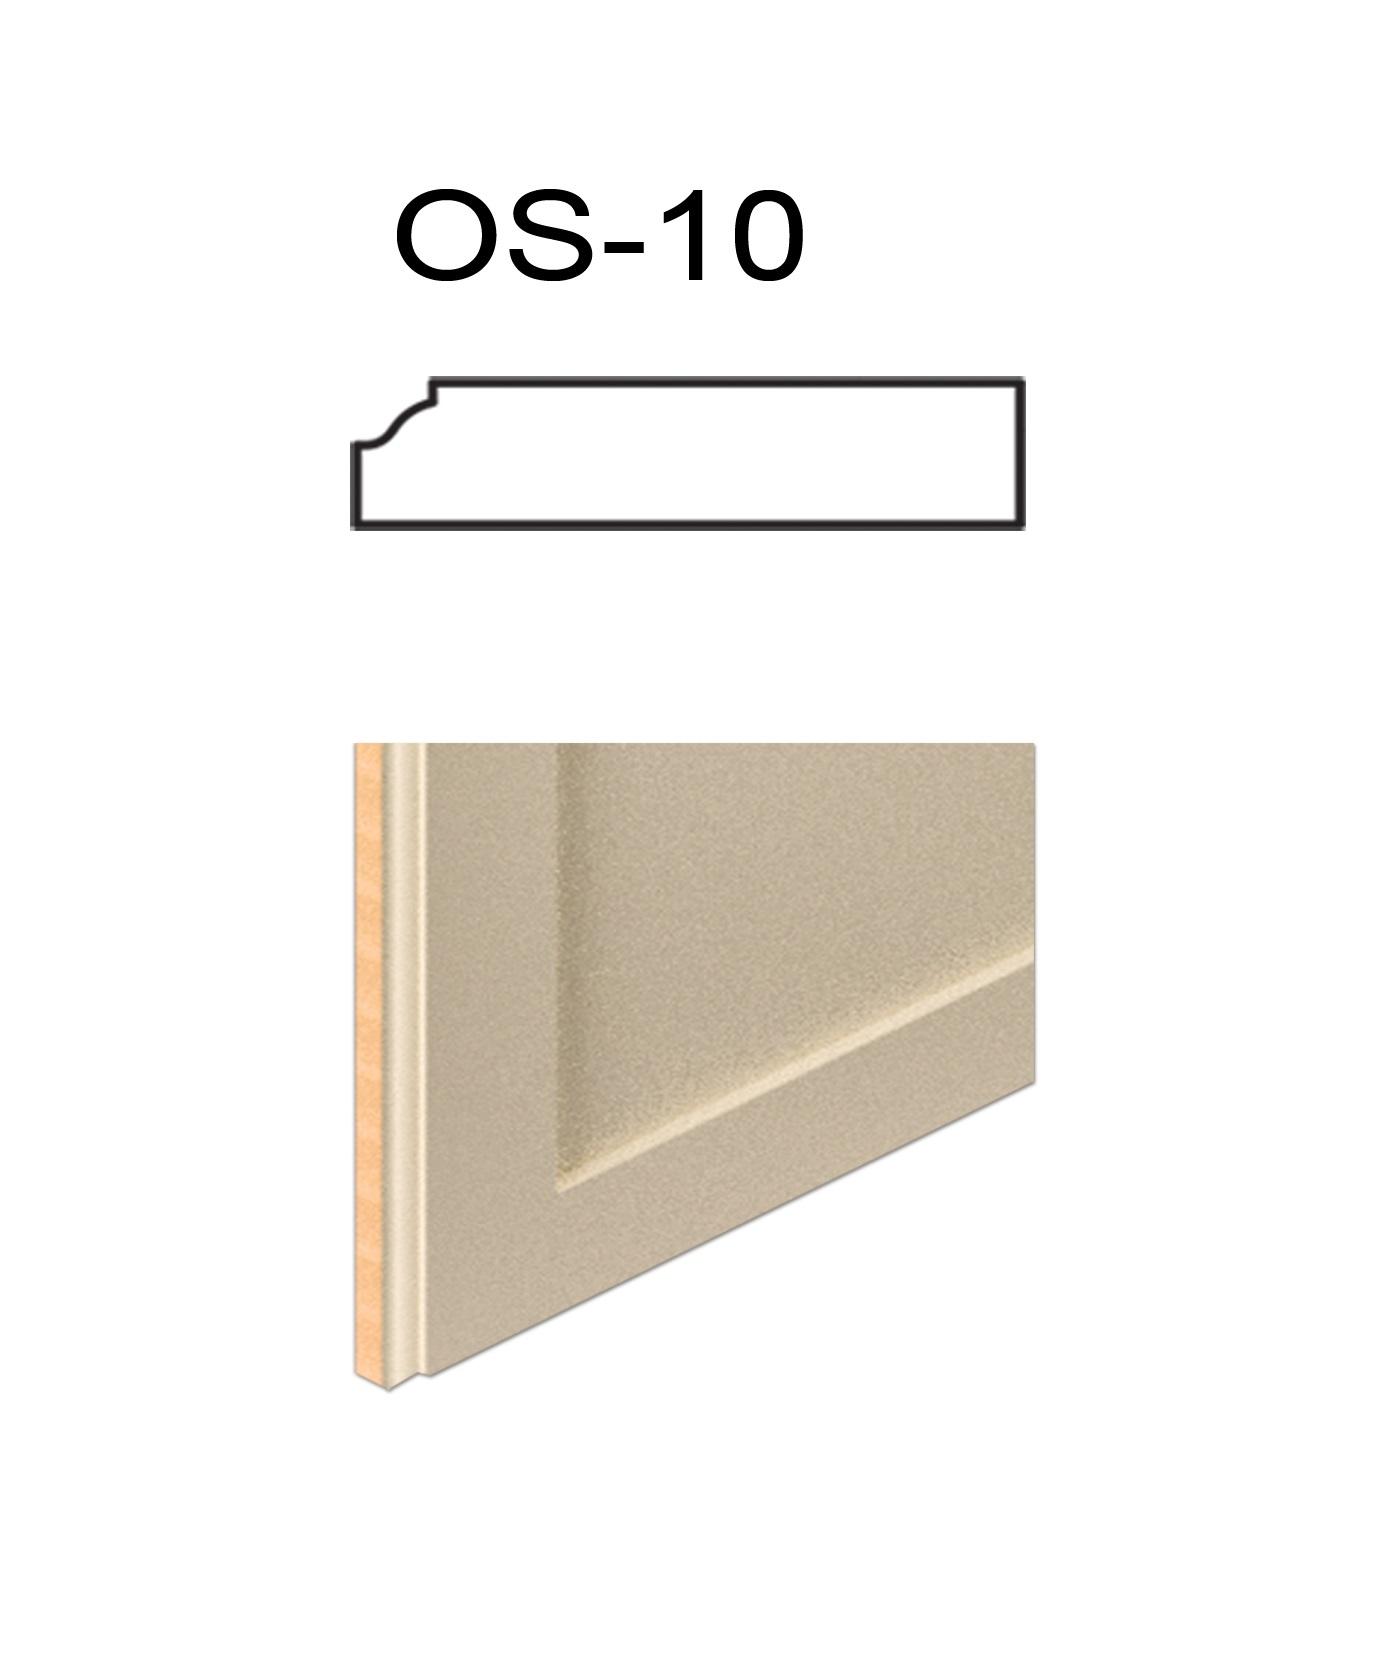 OS-10